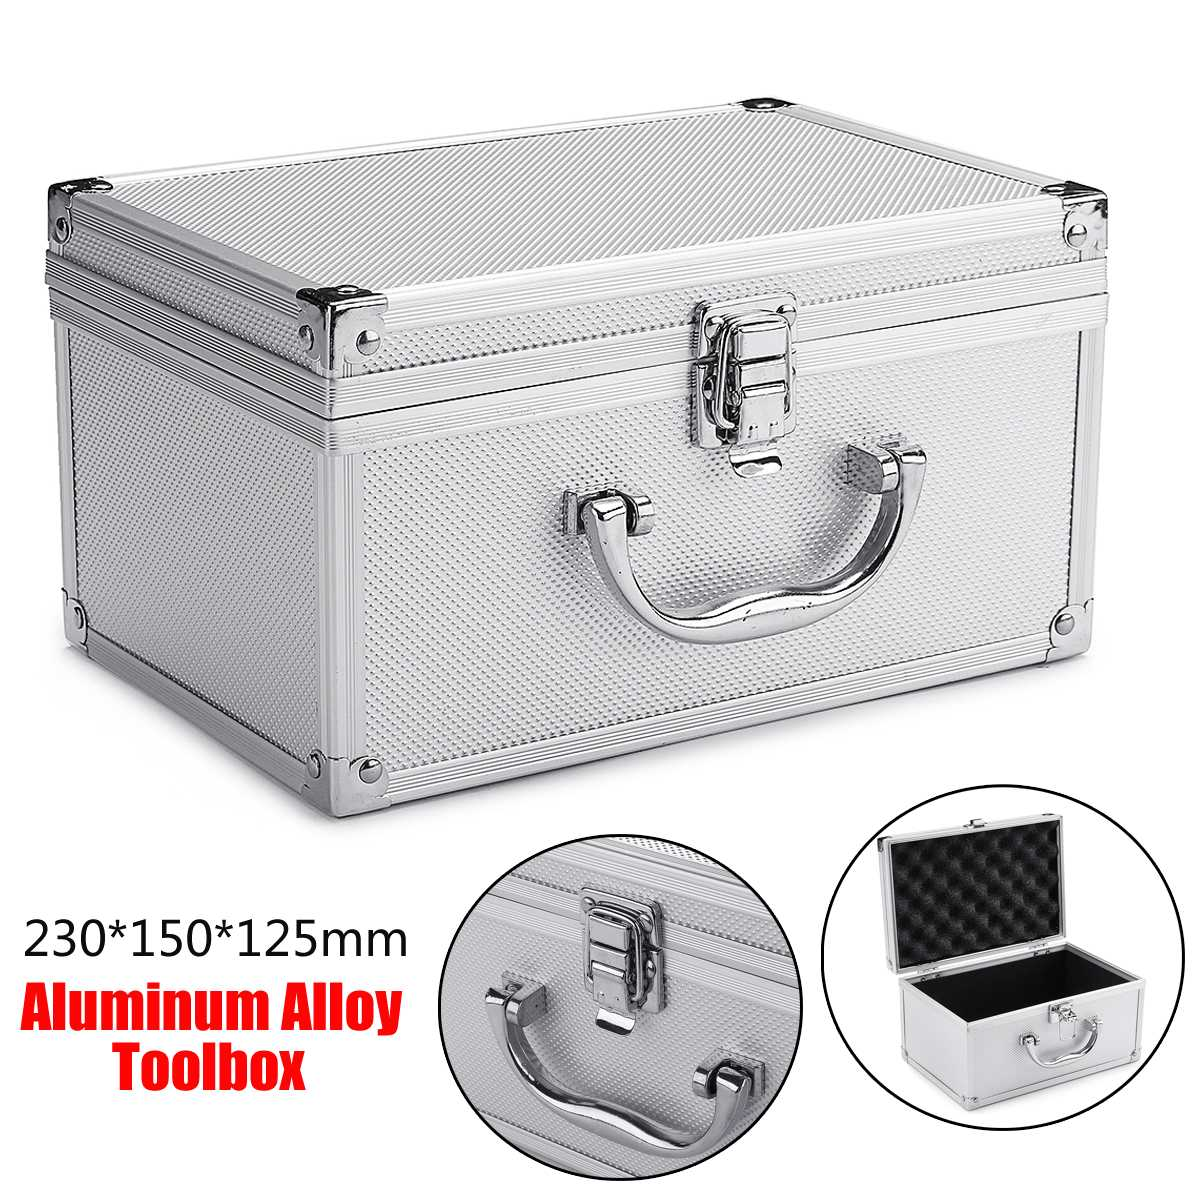 23x15x12.5cm Tool Box Aluminium Alloy Home Storage Box Portable Storage Suitcase Travel Luggage Organizer Case Tools